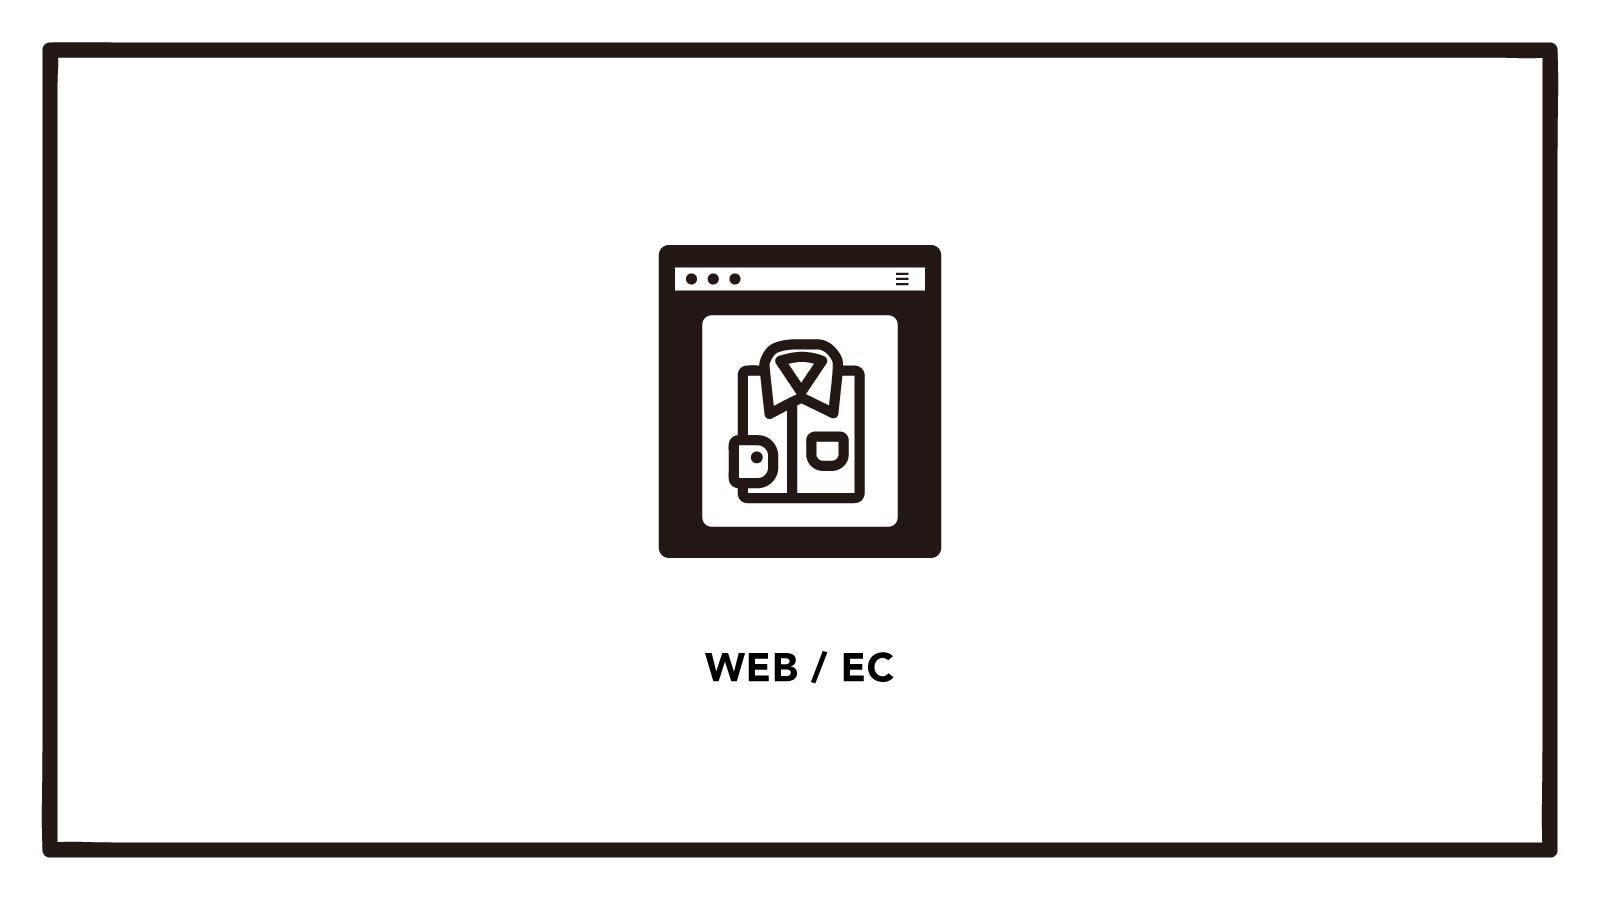 【WEB/EC担当】創業40年以上の大手ジュエリー・アクセサリーブランド!のカバー写真